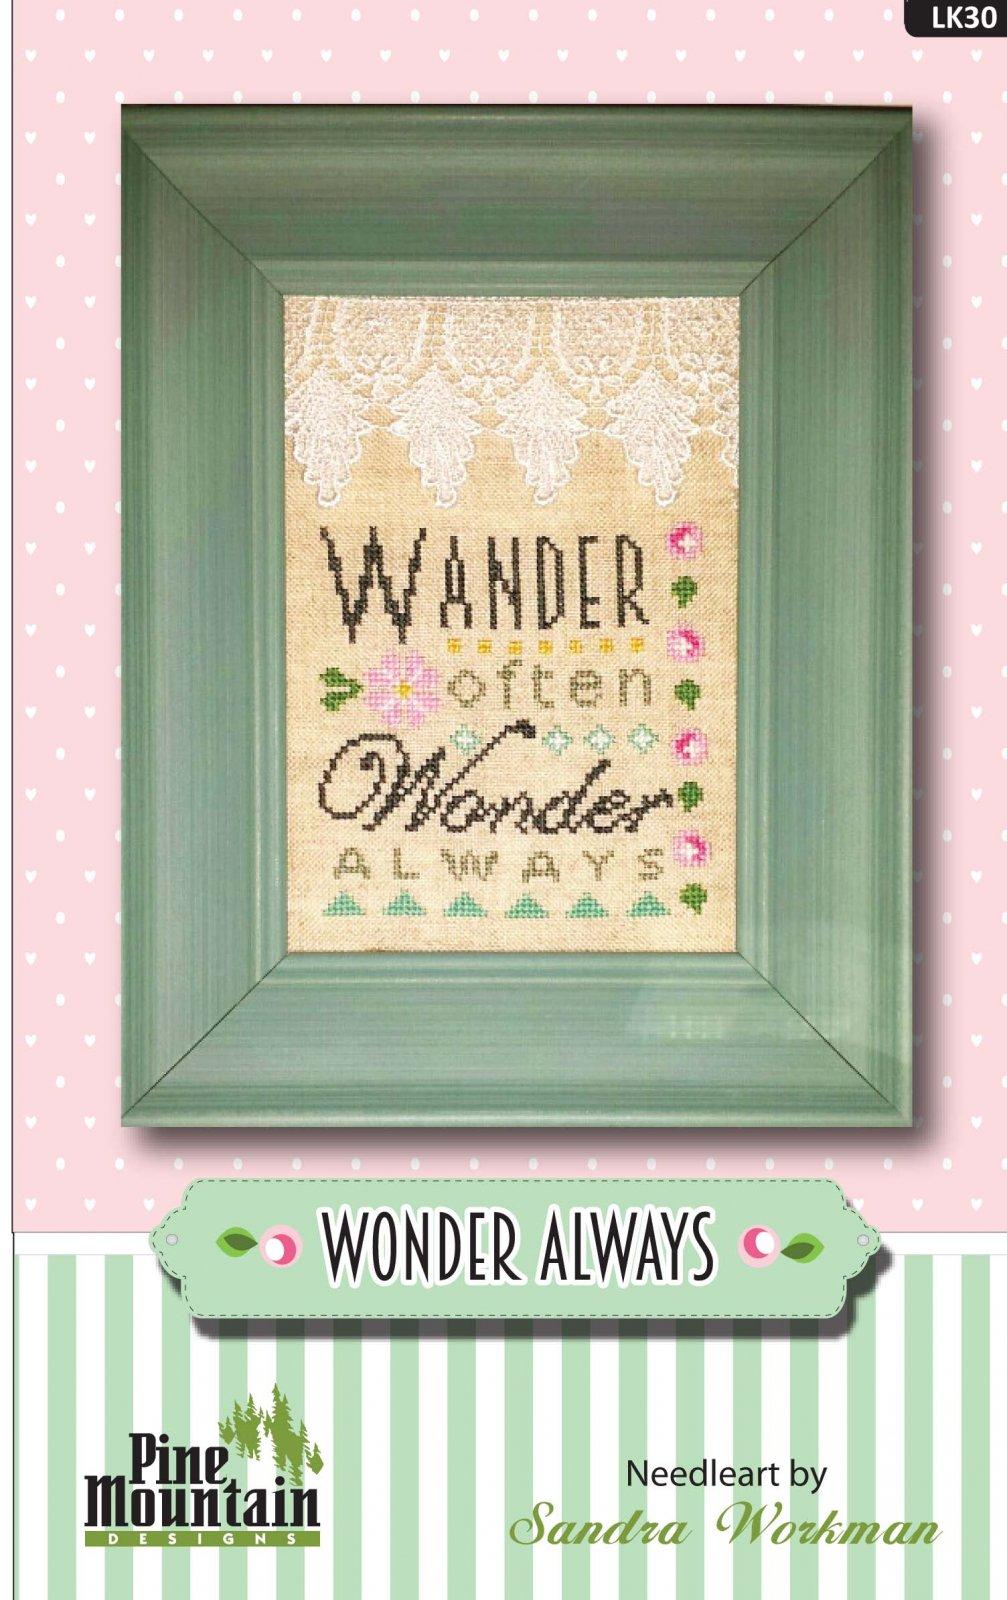 Wonder Always - Words of Wisdom LINEN KIT LK30